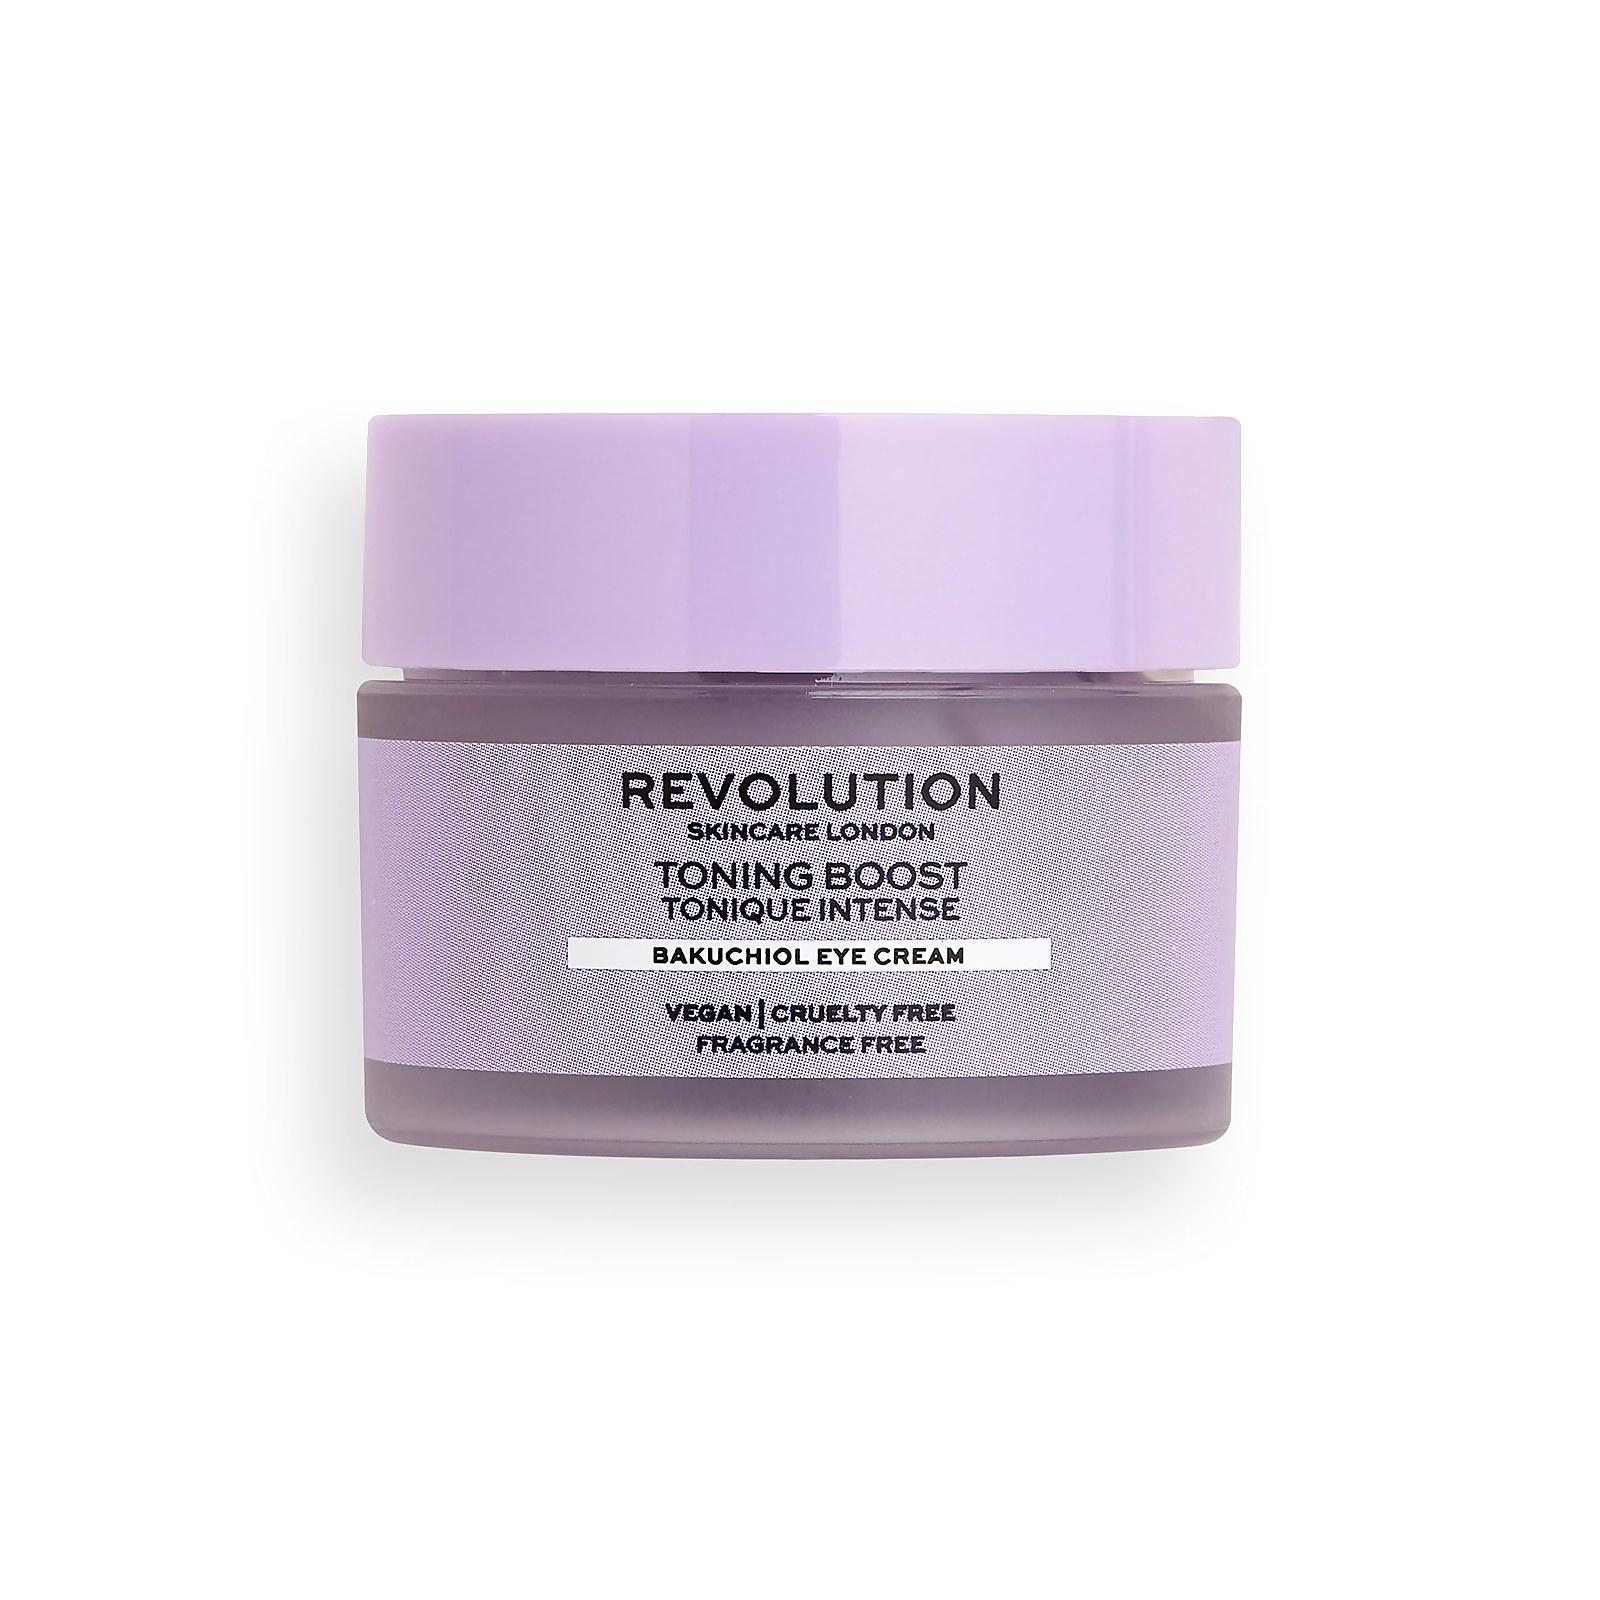 Купить Revolution Skincare Toning Boost Bakuchiol Eye Cream 15ml